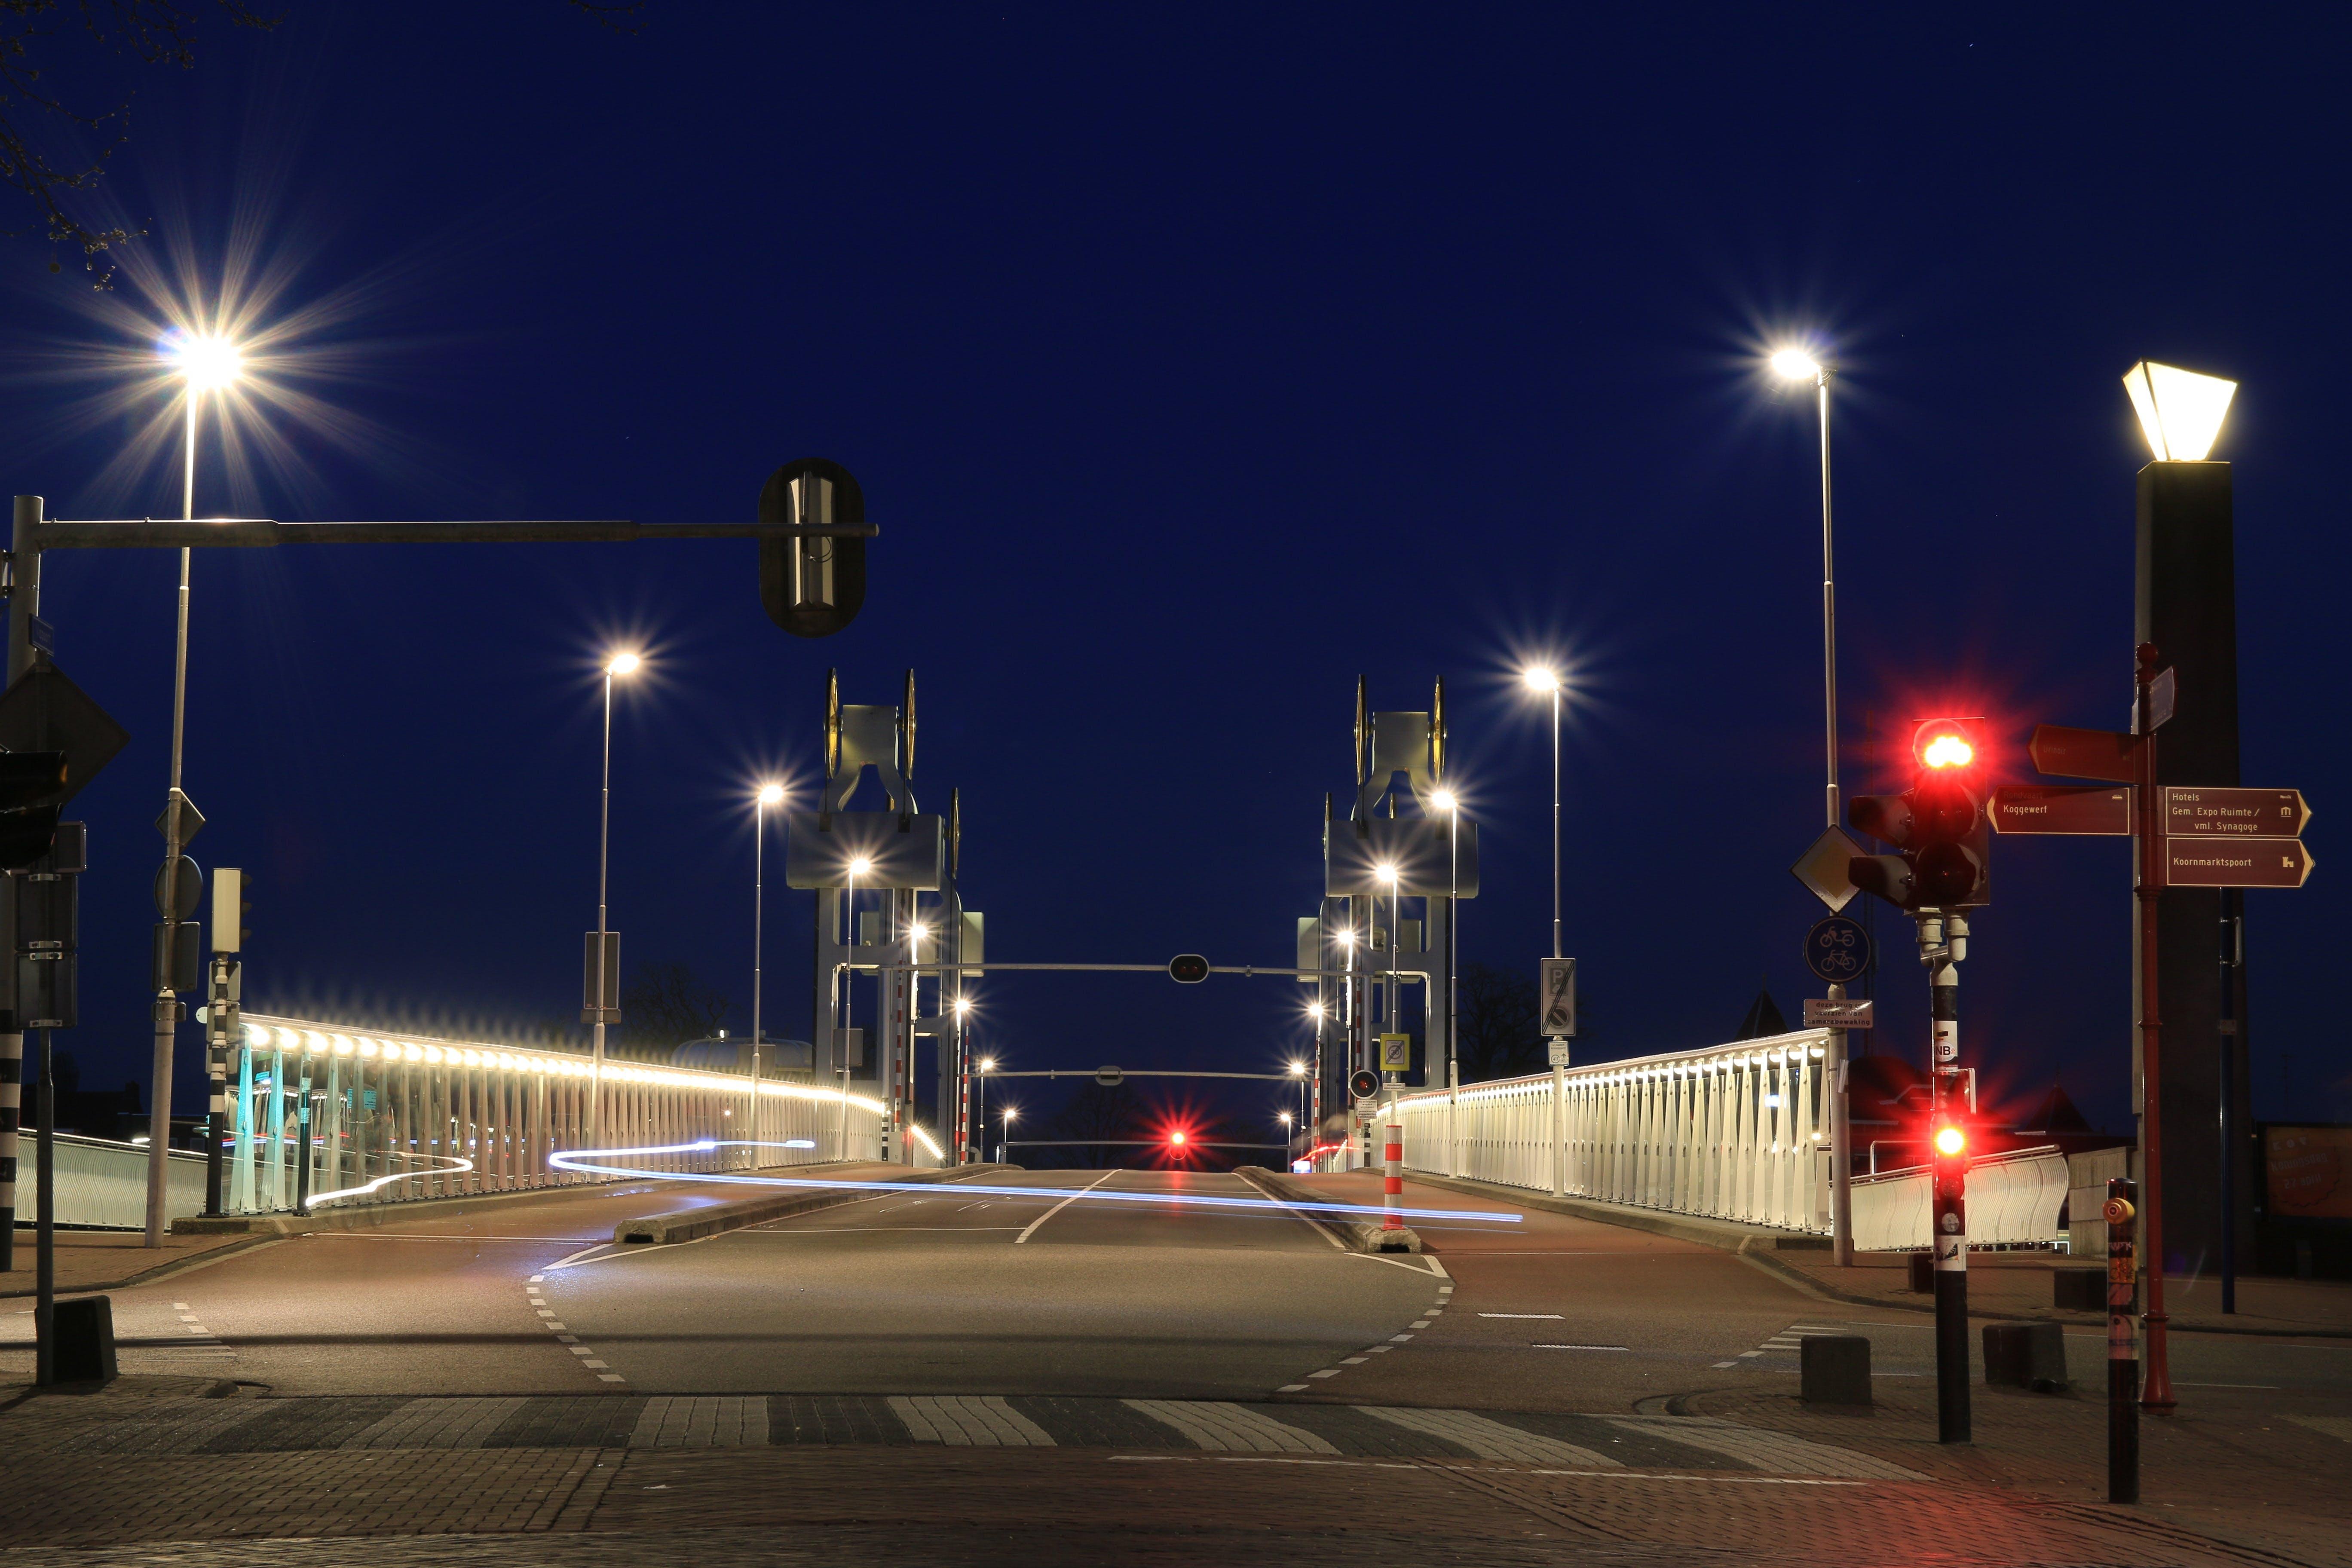 Fotos de stock gratuitas de acero, autopista, calle, carretera